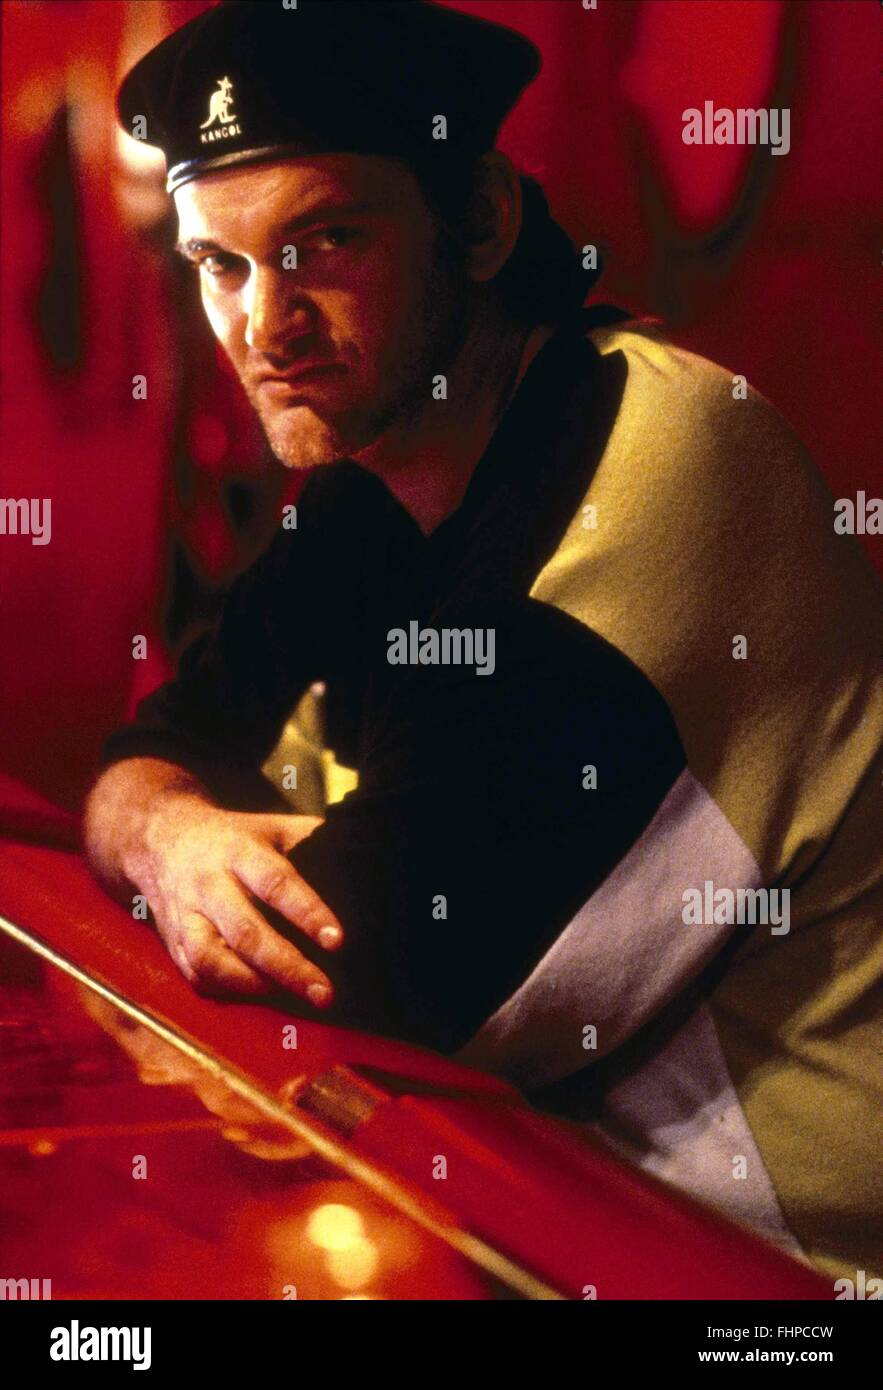 f1e31ece6ba73 Jackie Brown Quentin Tarantino Film Stock Photos   Jackie Brown ...